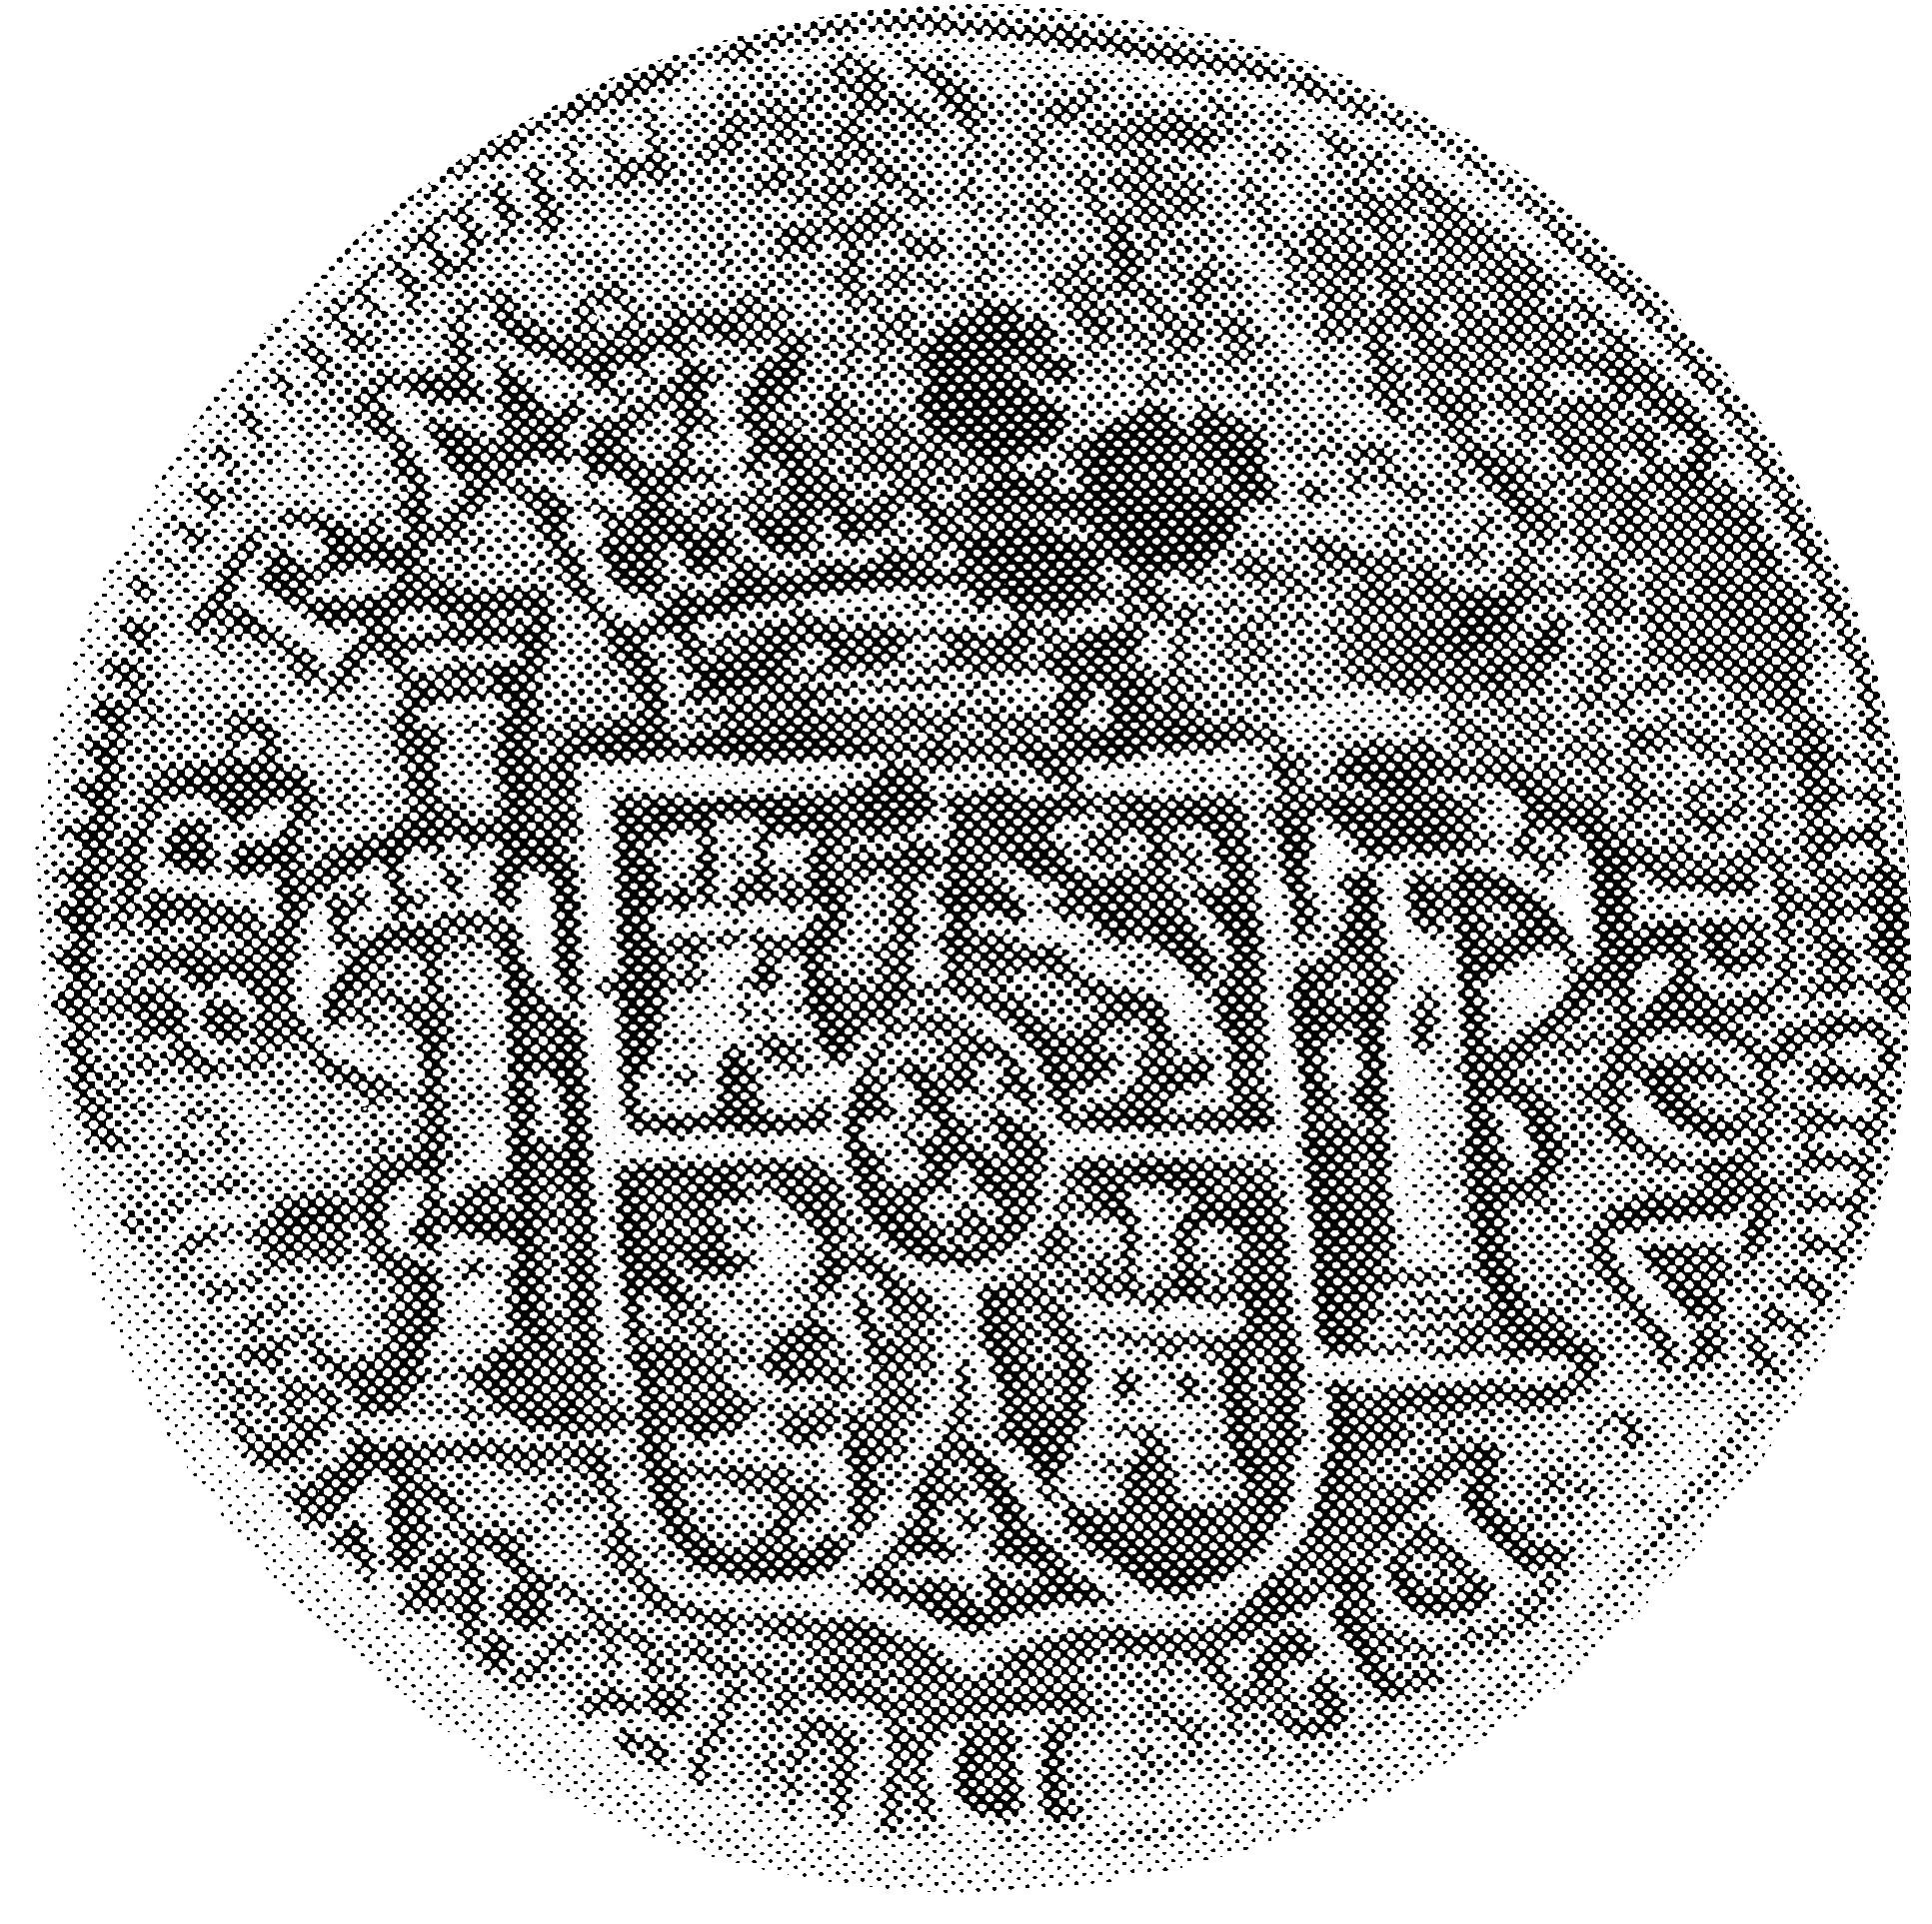 1811-1814 Mexico DURANGO 8 Reales reverse